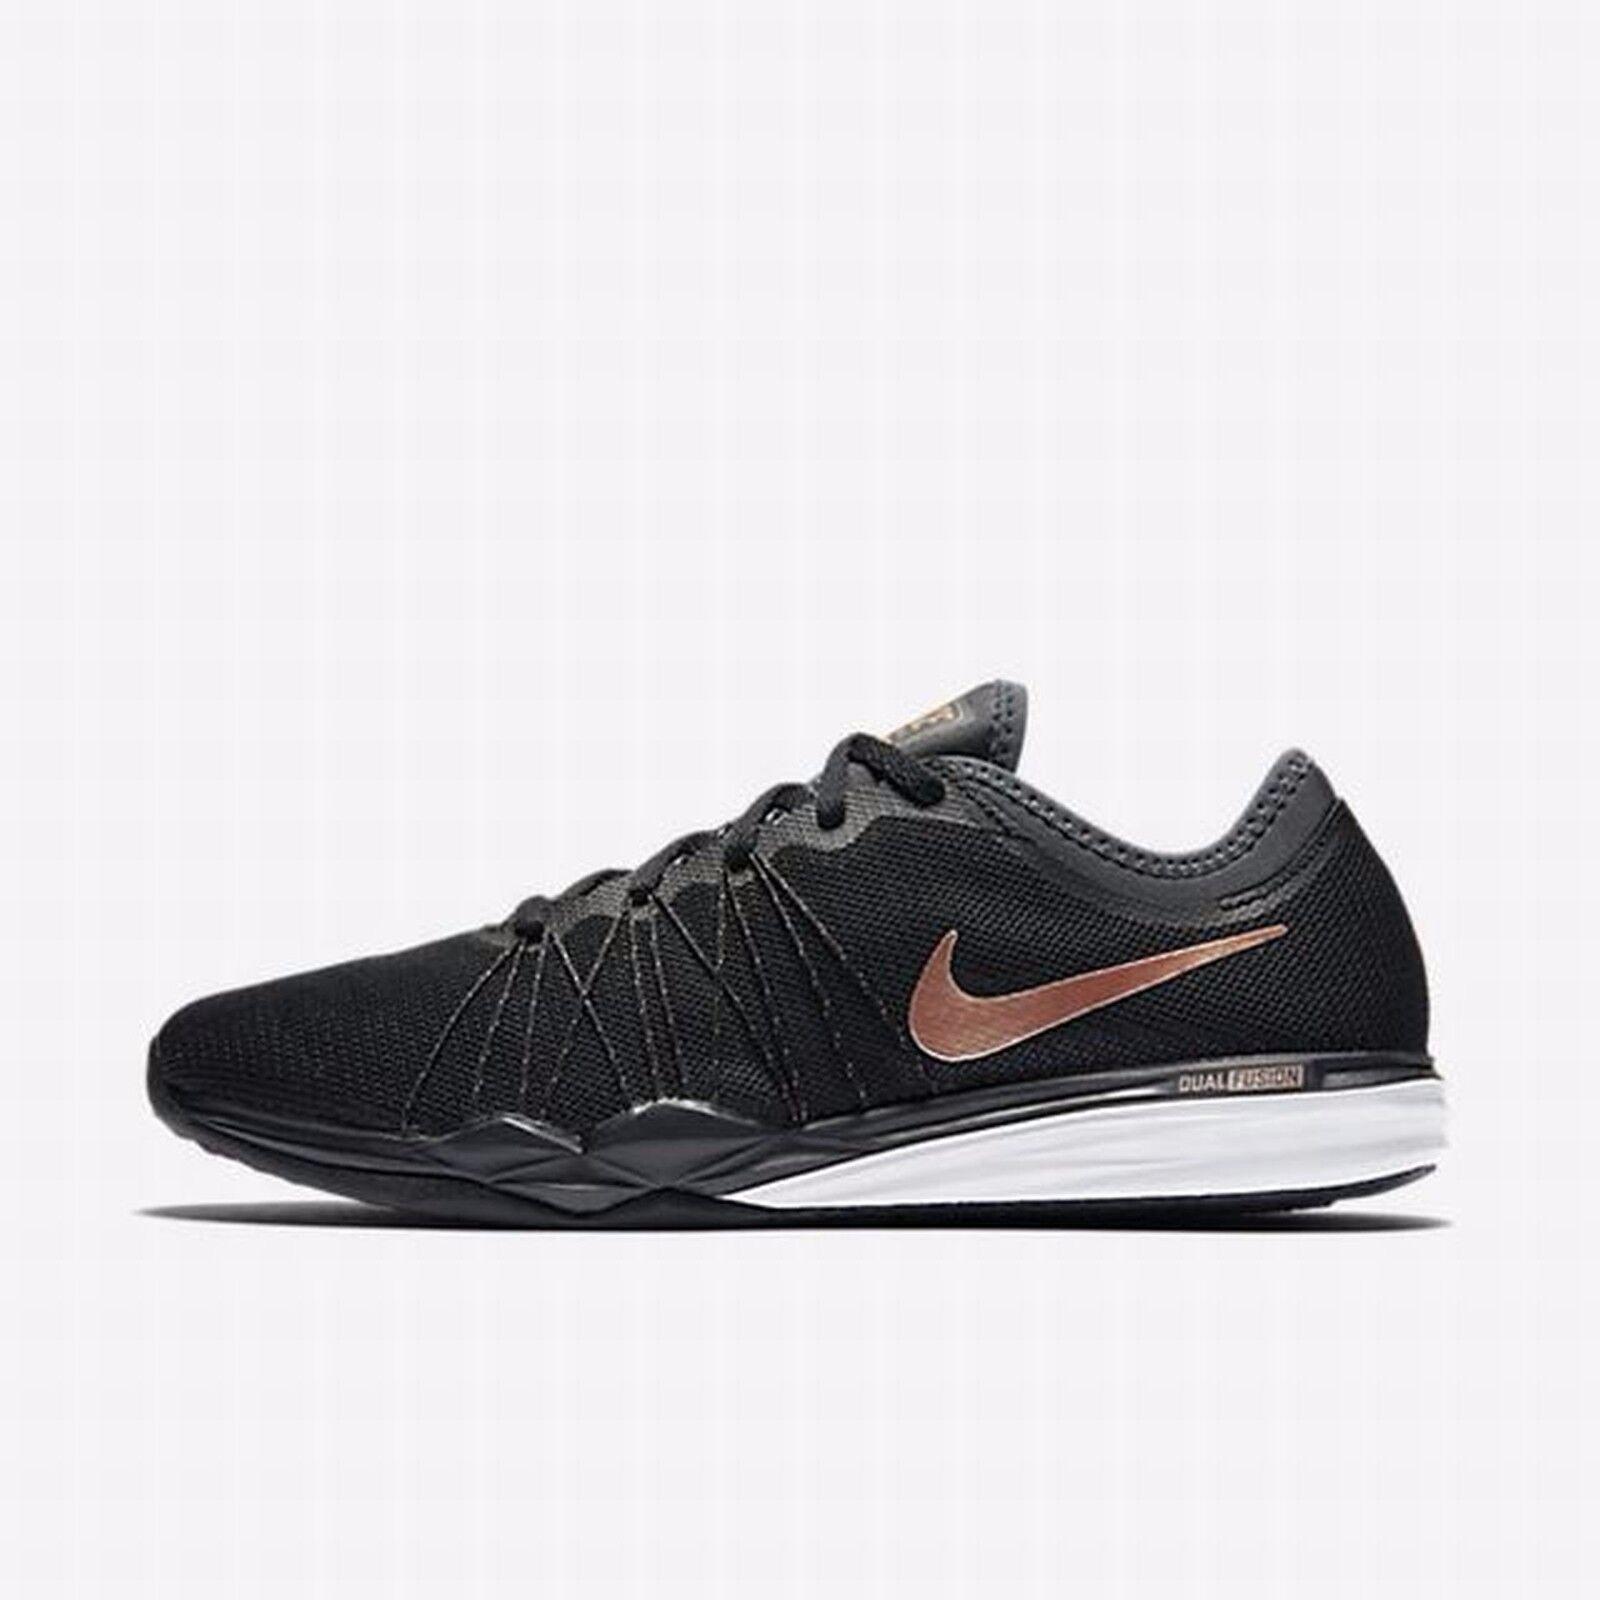 Nike Dual Fusion TR Black/Anthracite/White/Mtlc Red Bronze 844674-004 Wmn Sz 11